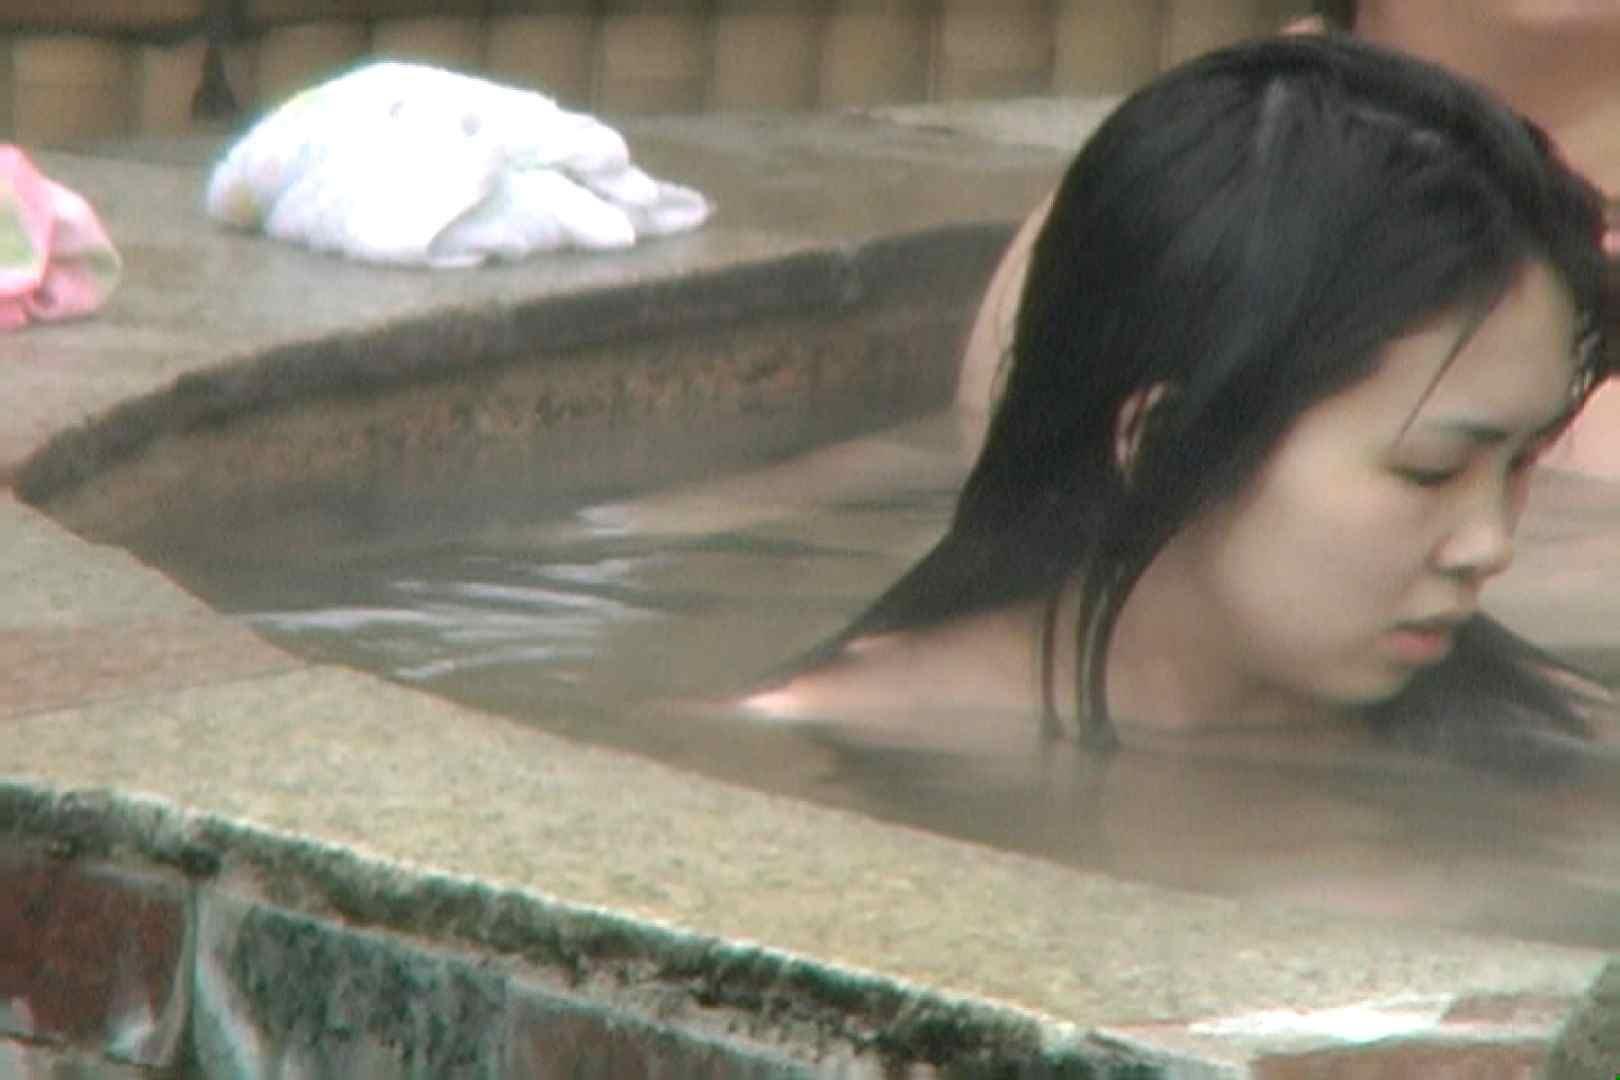 Aquaな露天風呂Vol.646 露天 のぞき動画画像 97画像 74